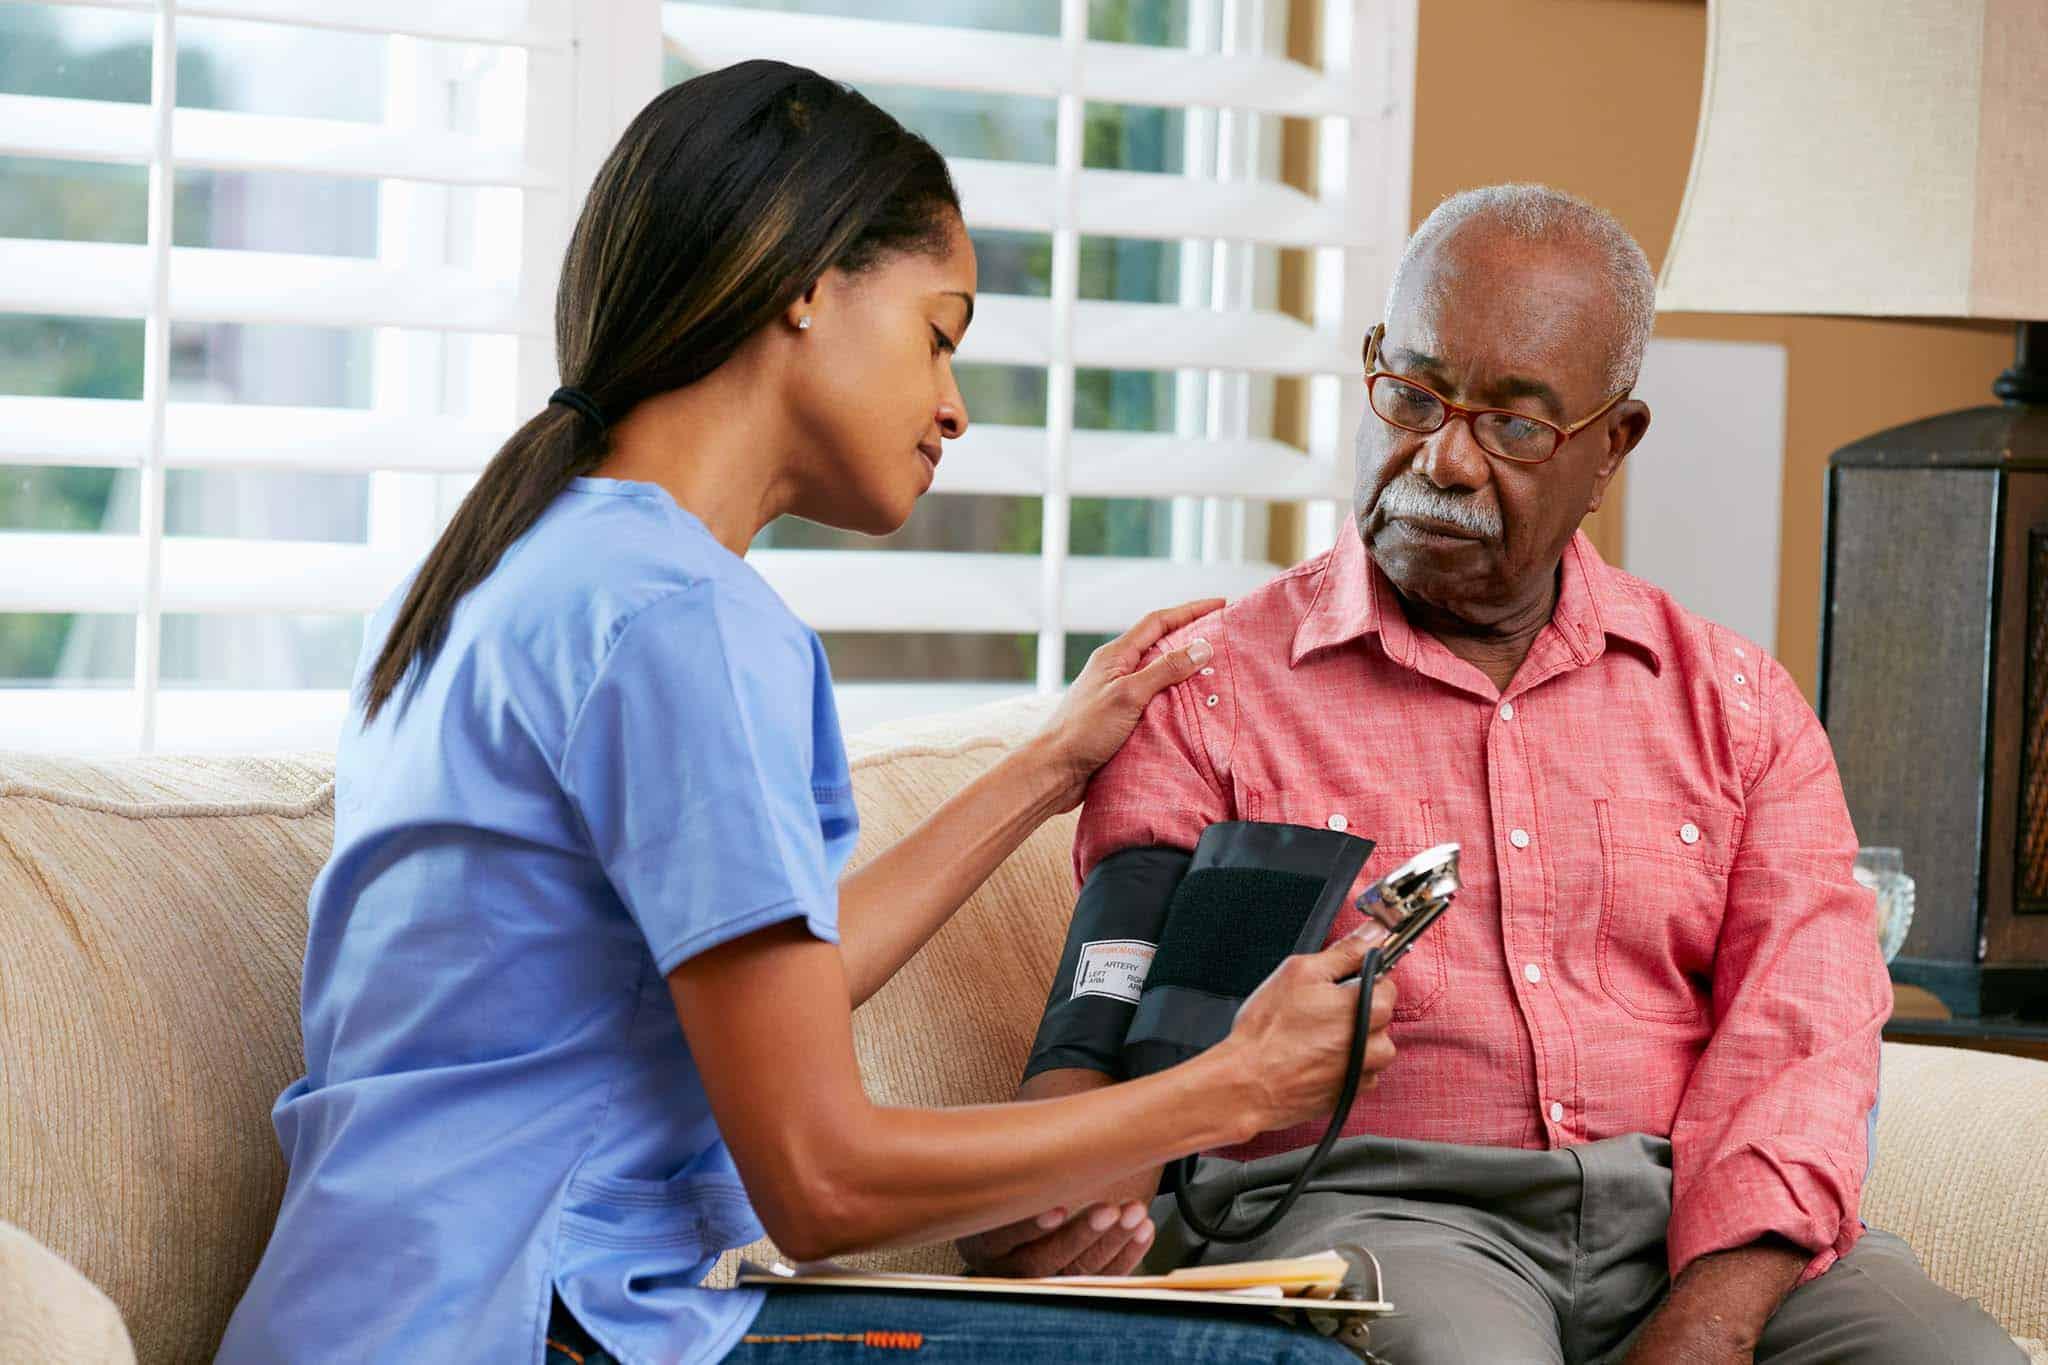 LTC Nursing and Executive jobs